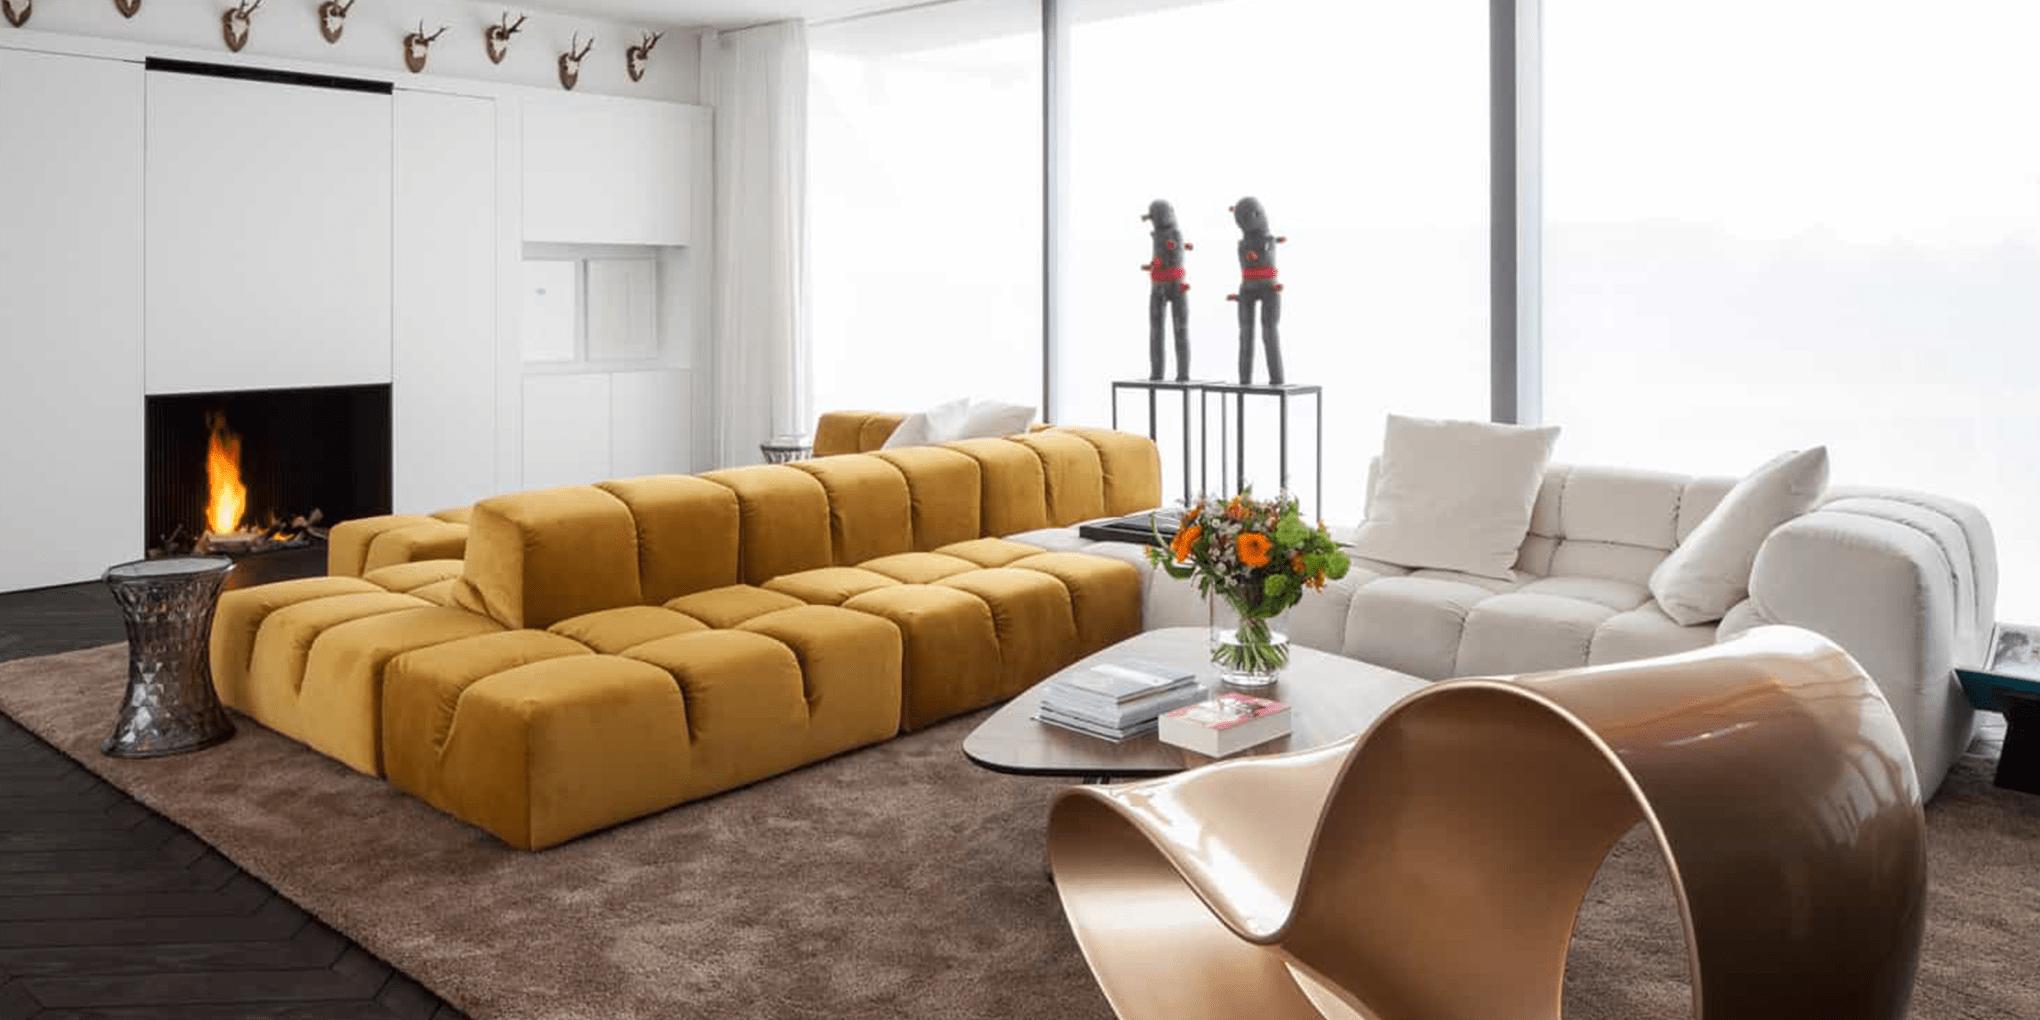 paris1 | Baeyens & Beck architecten Gent | architect nieuwbouw renovatie interieur | high end | architectenbureau